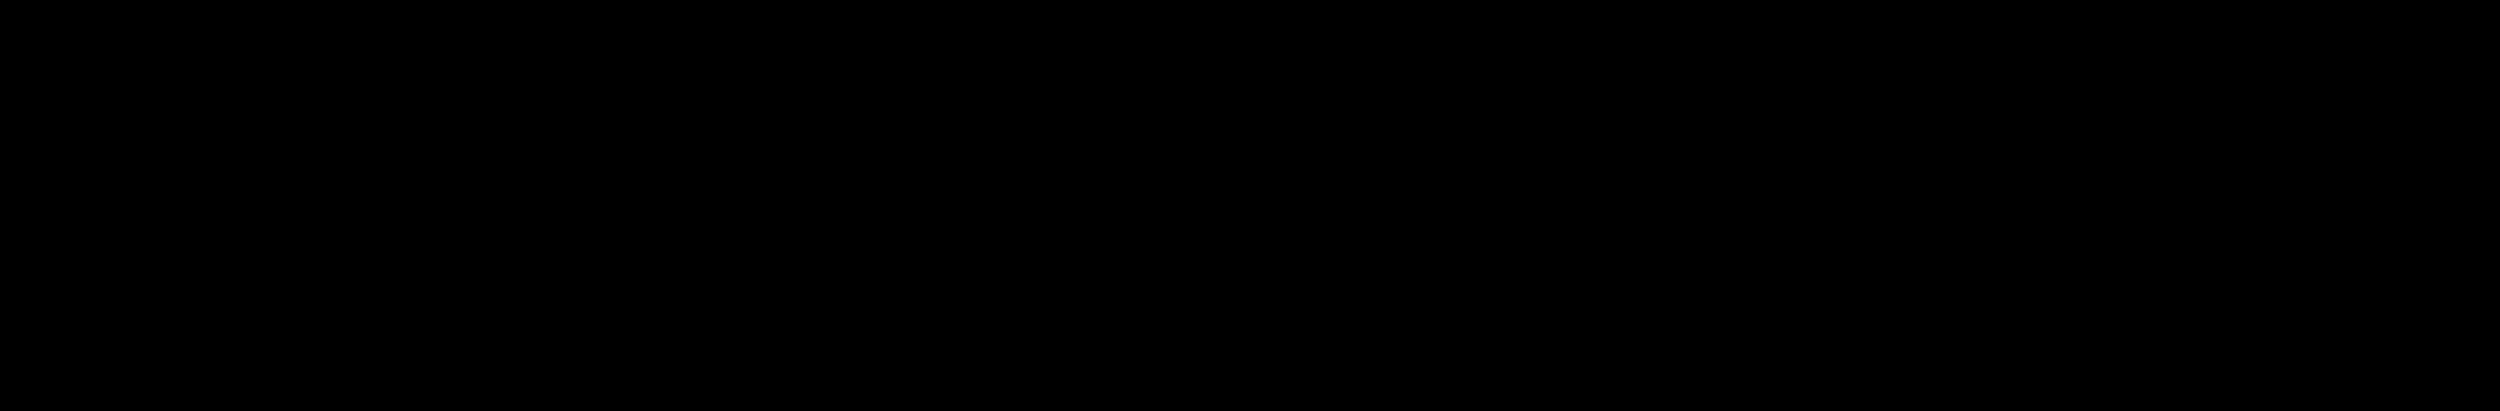 1.-wifi.png